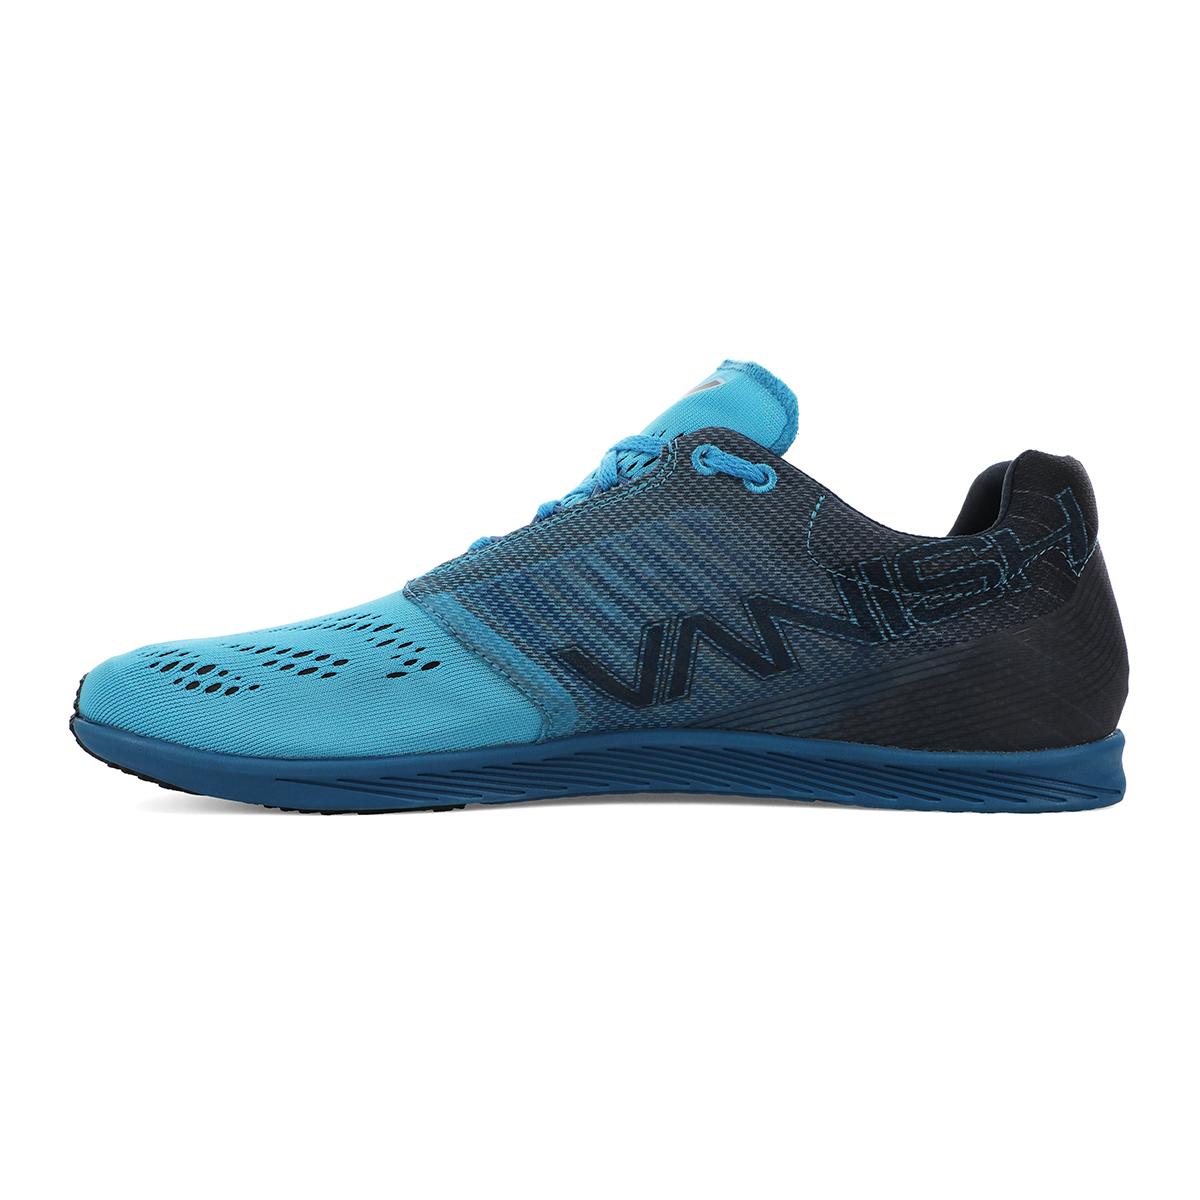 Altra Vanish R Running Shoe - Color: Electric Blue - Size: M4/W5.5 - Width: Regular, Electric Blue, large, image 2